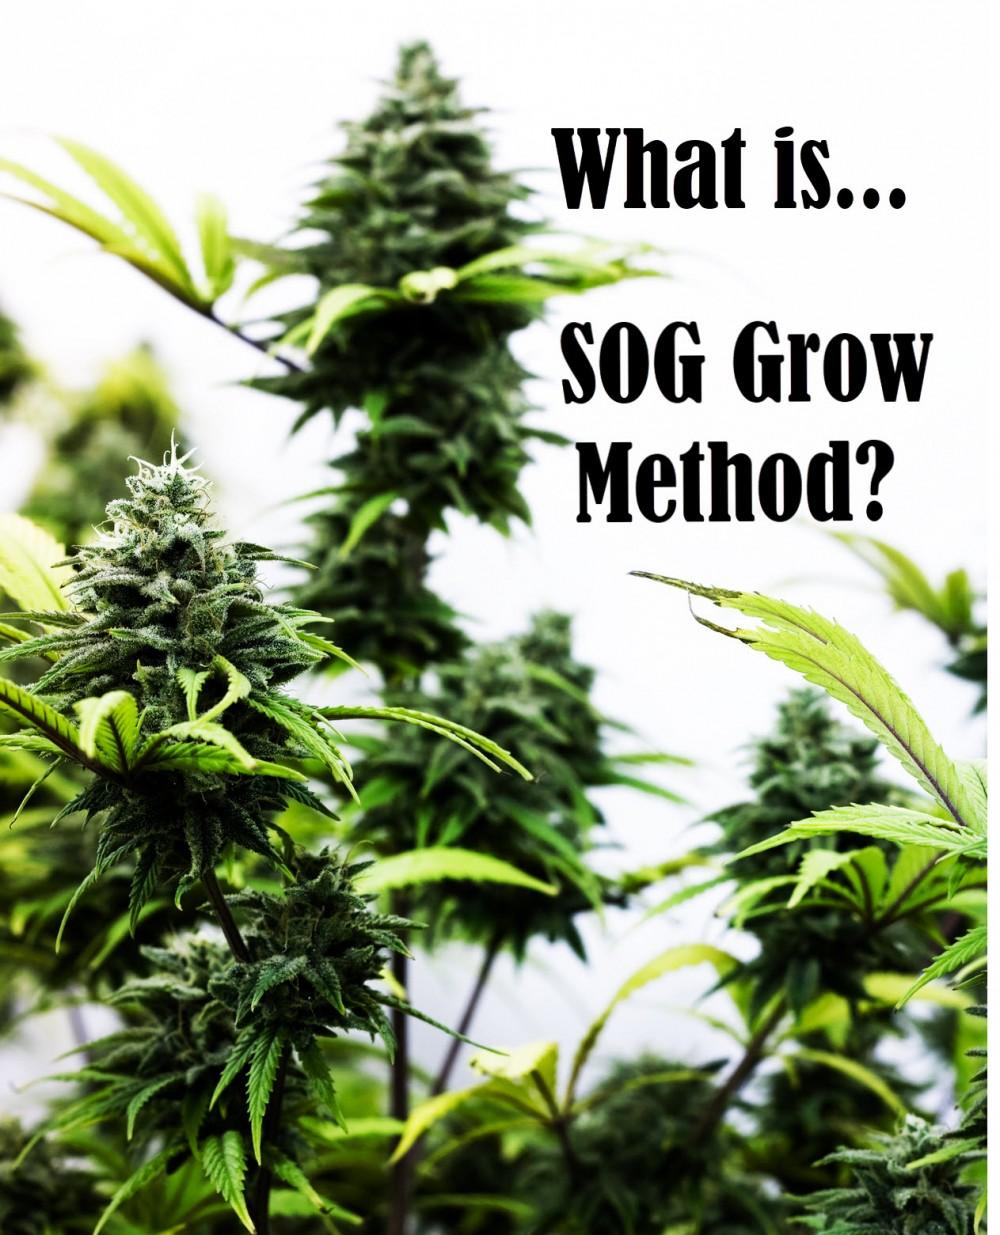 SOG grow method - sea of green